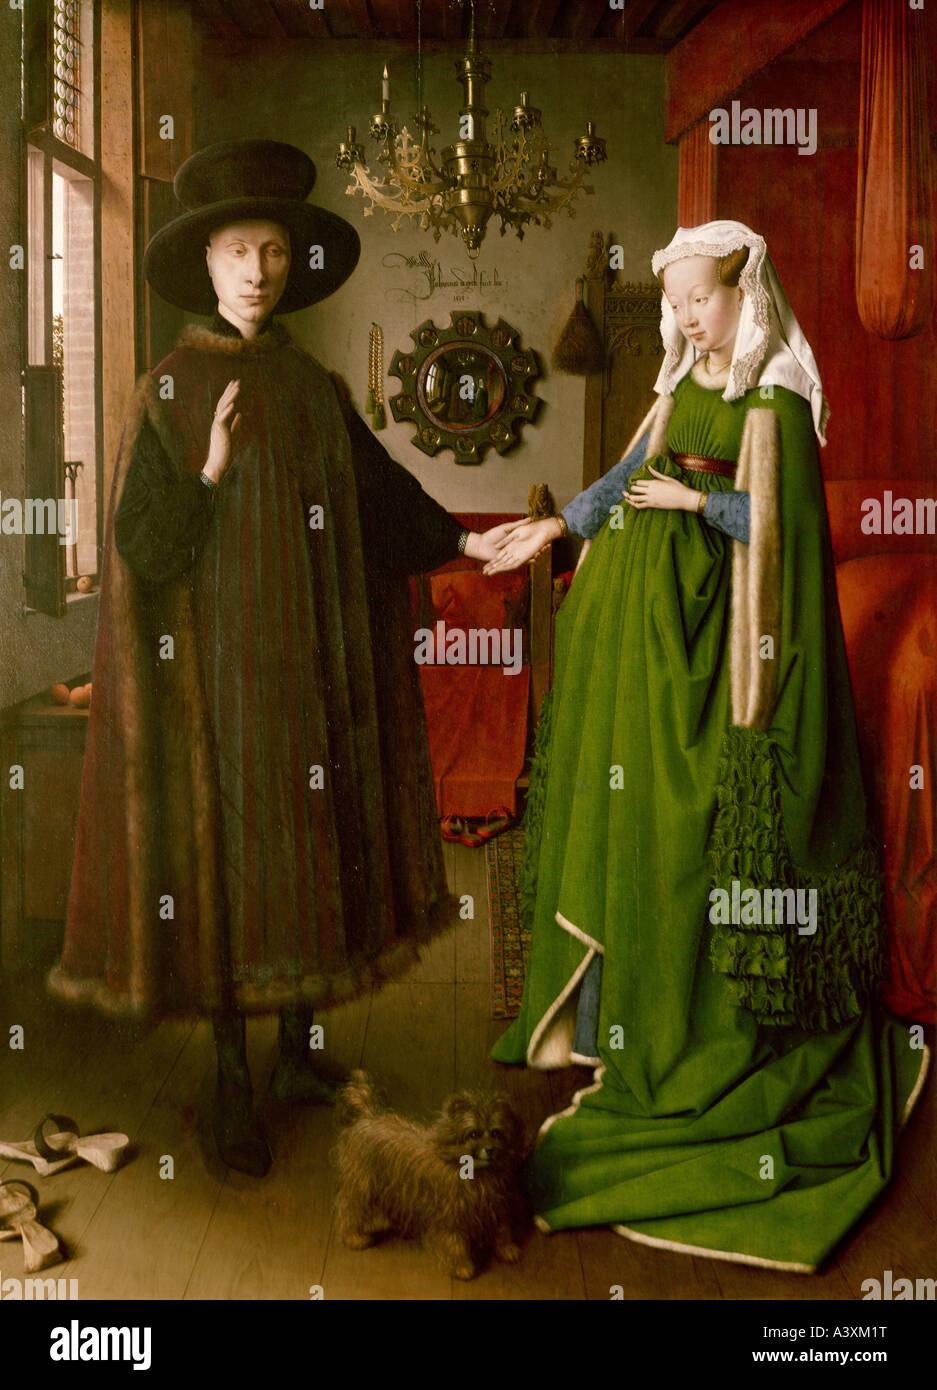 'Fine Arts, Jan van Eyck, (vers 1390, - 1441), peinture, 'le mariage Arnolfini', 1434, huile sur panneau, Photo Stock